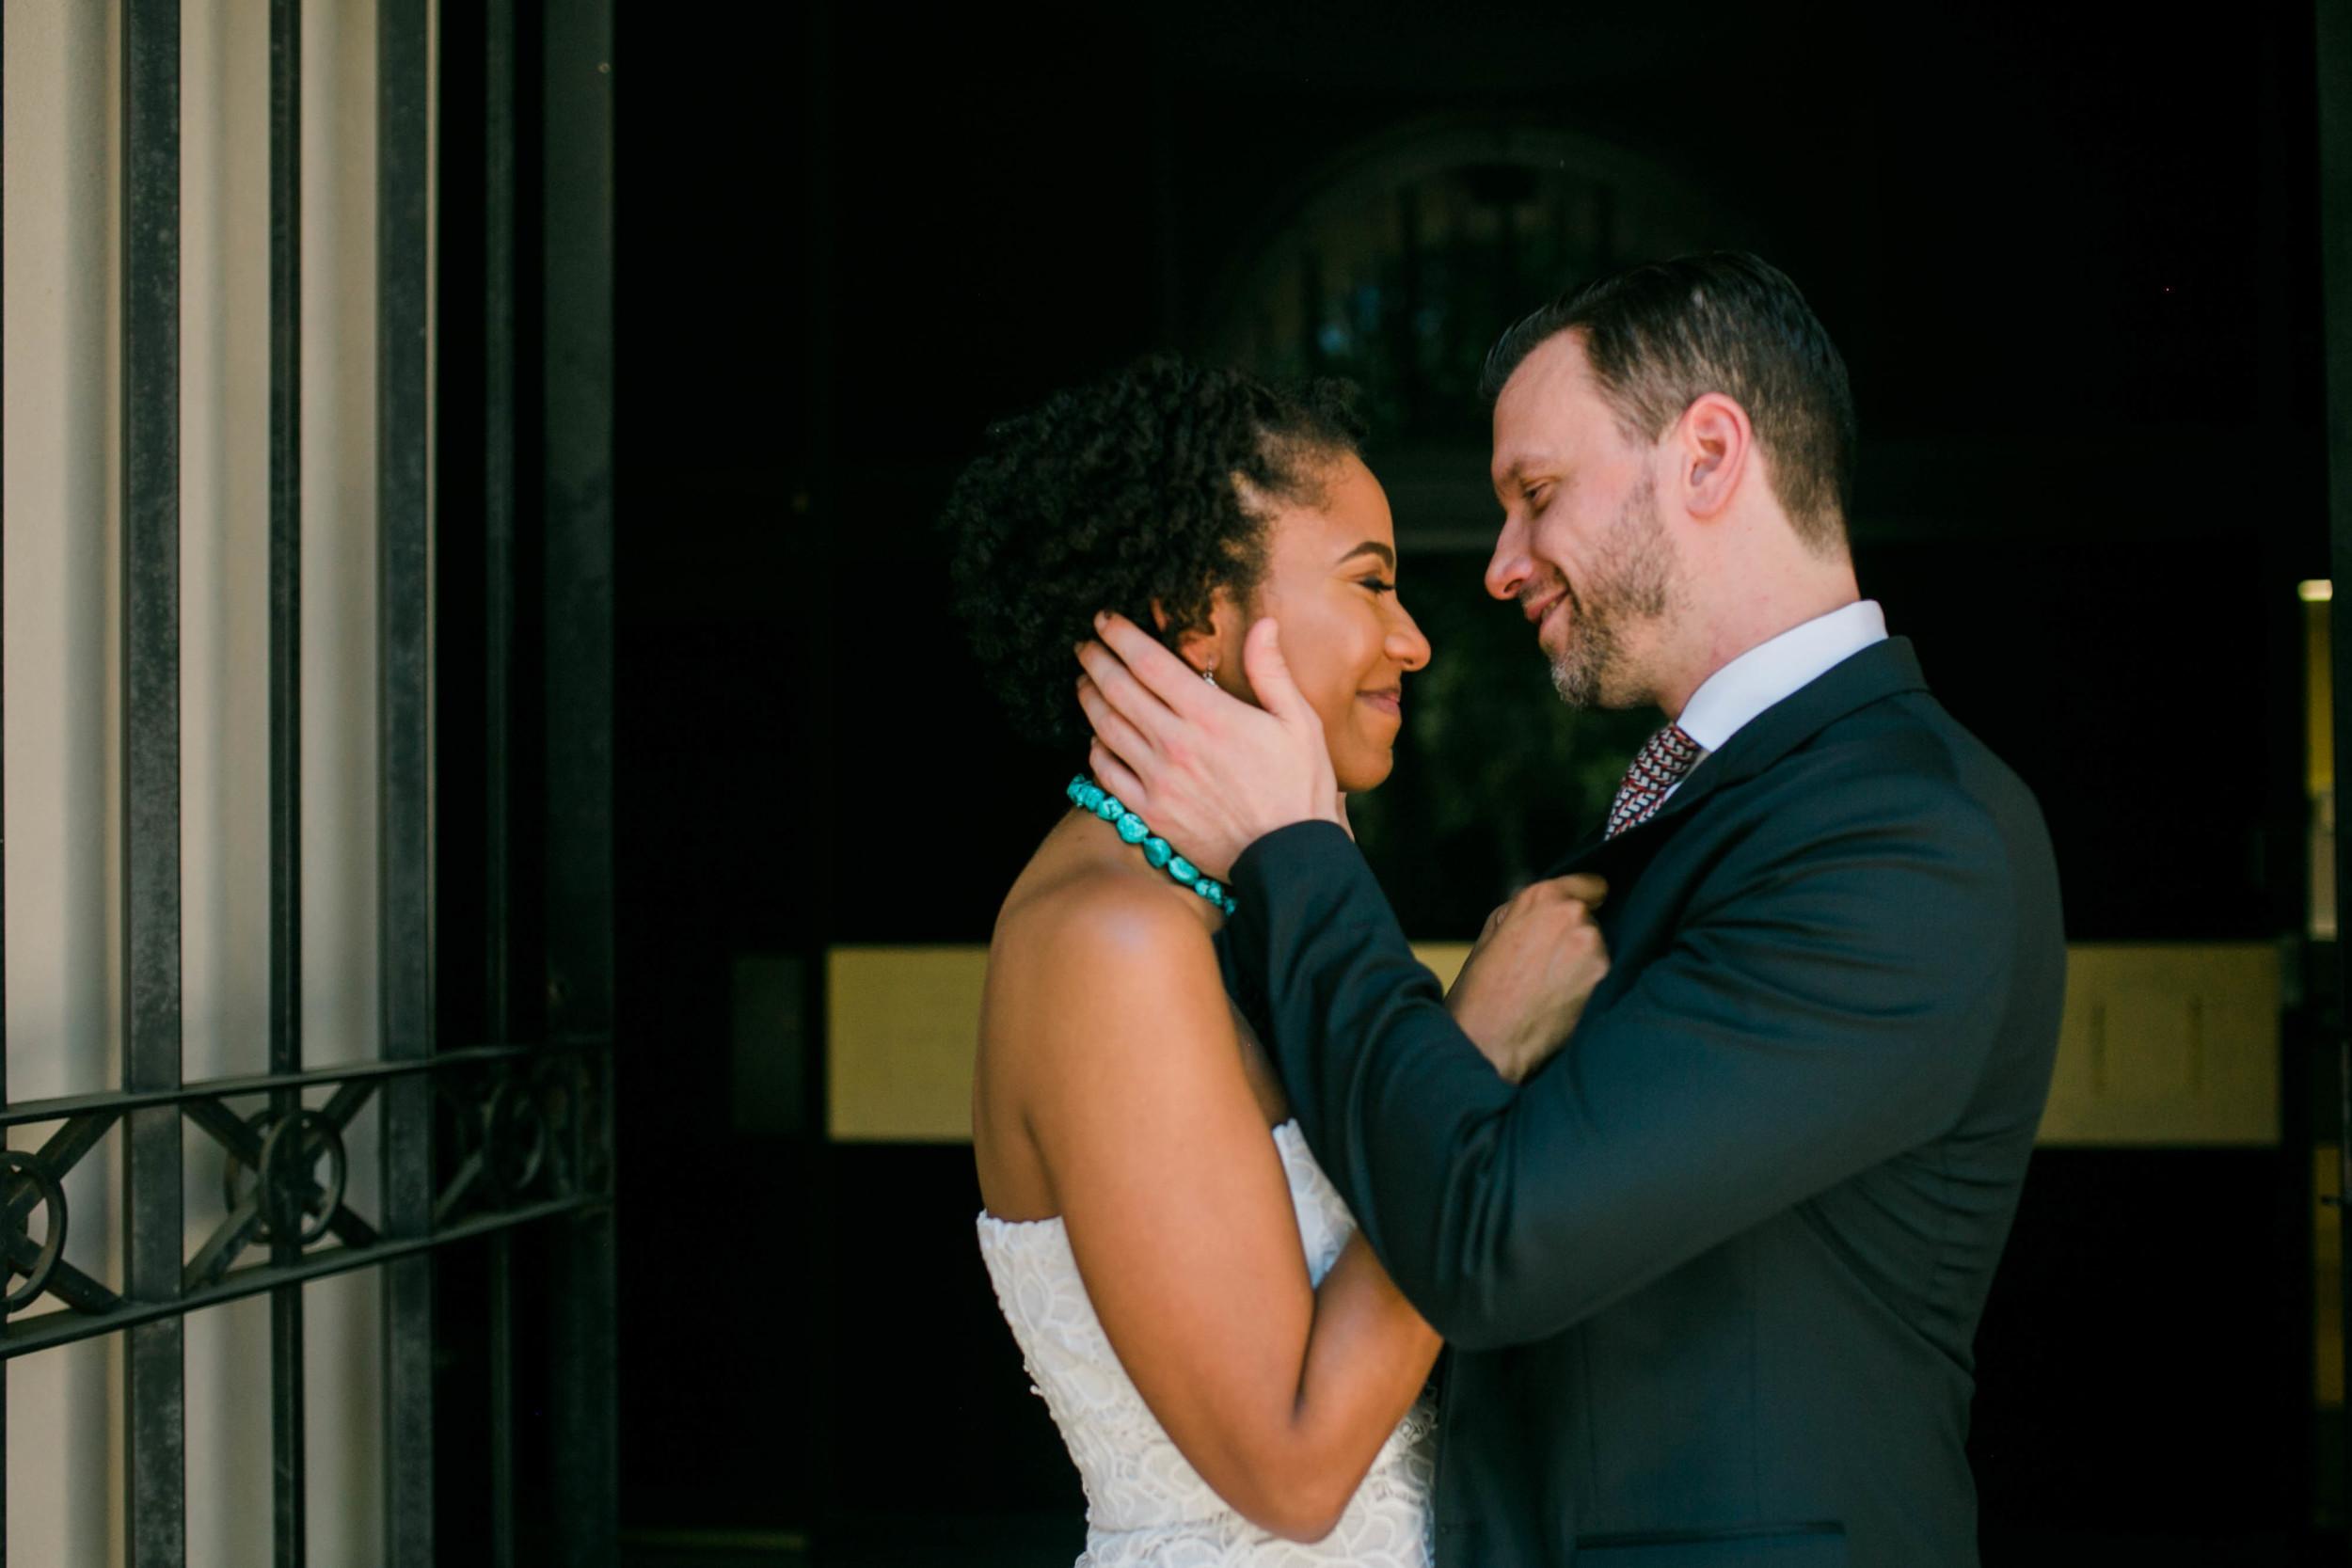 Dekalb-County-Courthouse-Wedding-Photos-Kiyah-C-Photography-62.jpg